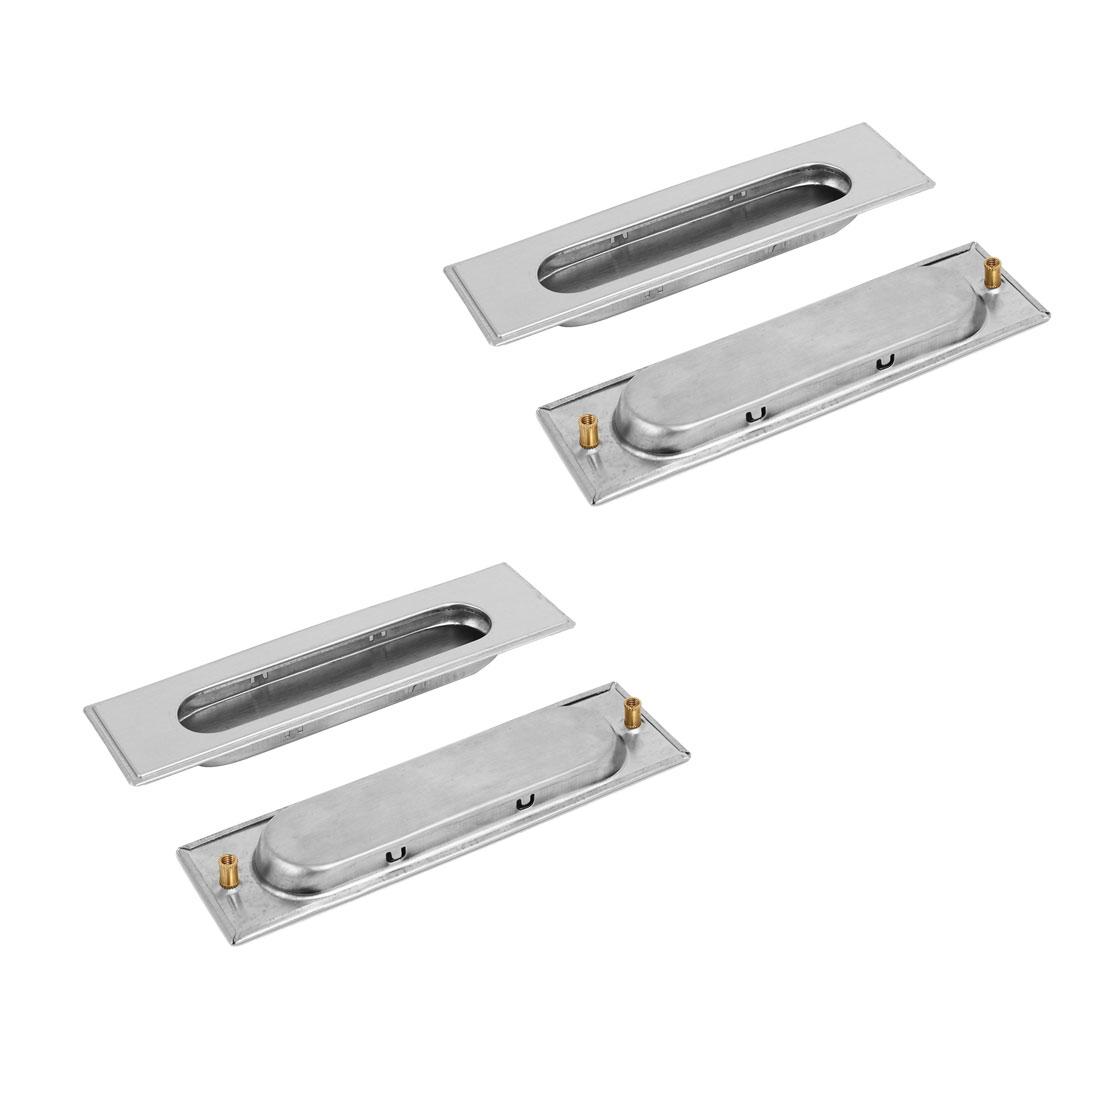 "5.5"" Length Rectangular Recessed Flush Pull Handle 4PCS for Cabinet Drawer Door"